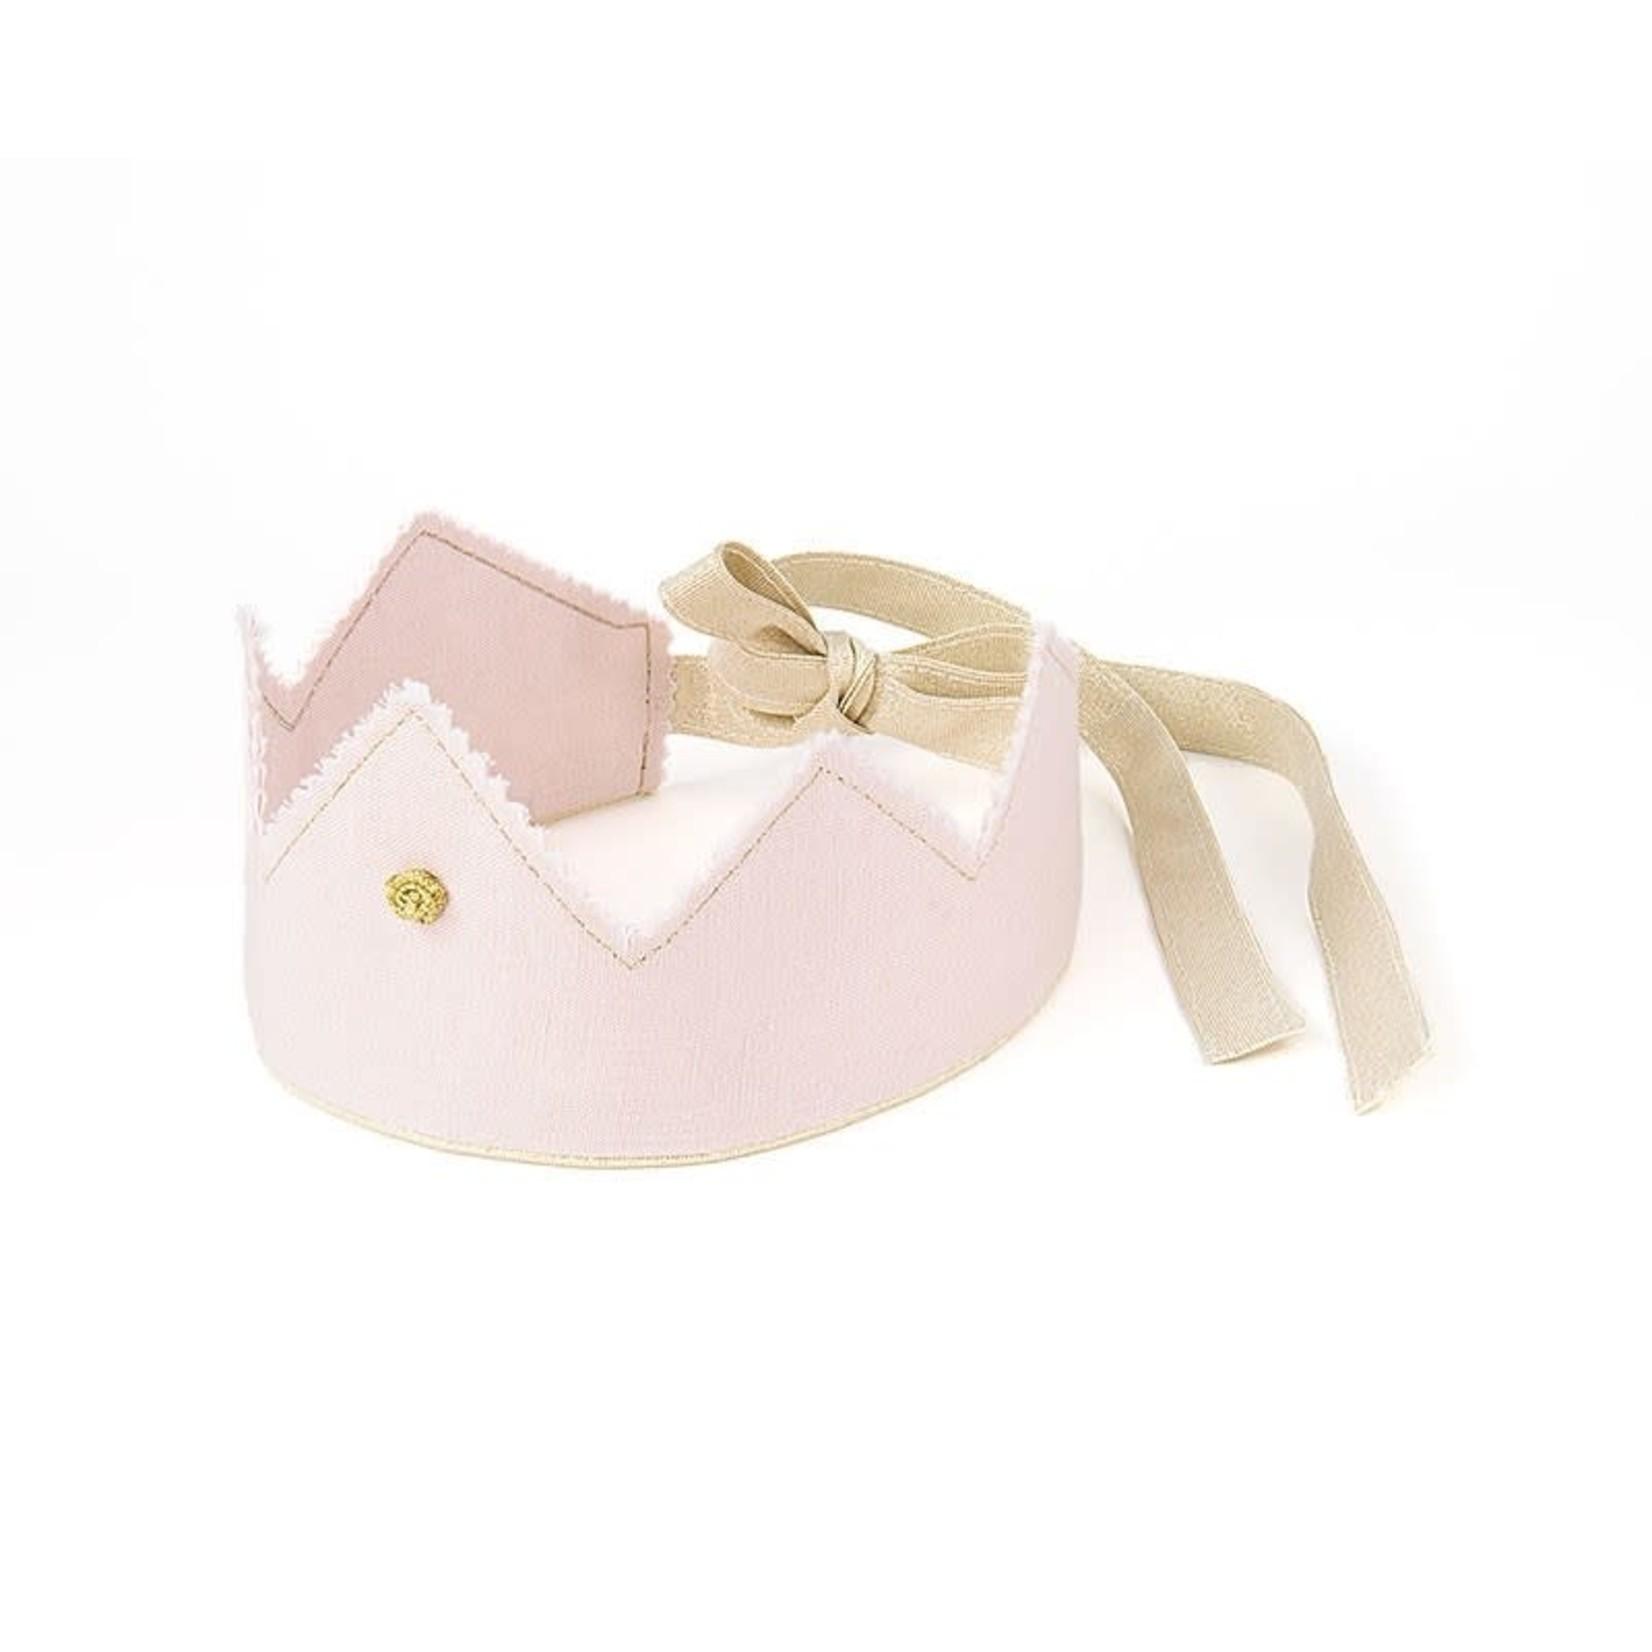 Cotton & Sweets Linen Crown - Powder Pink